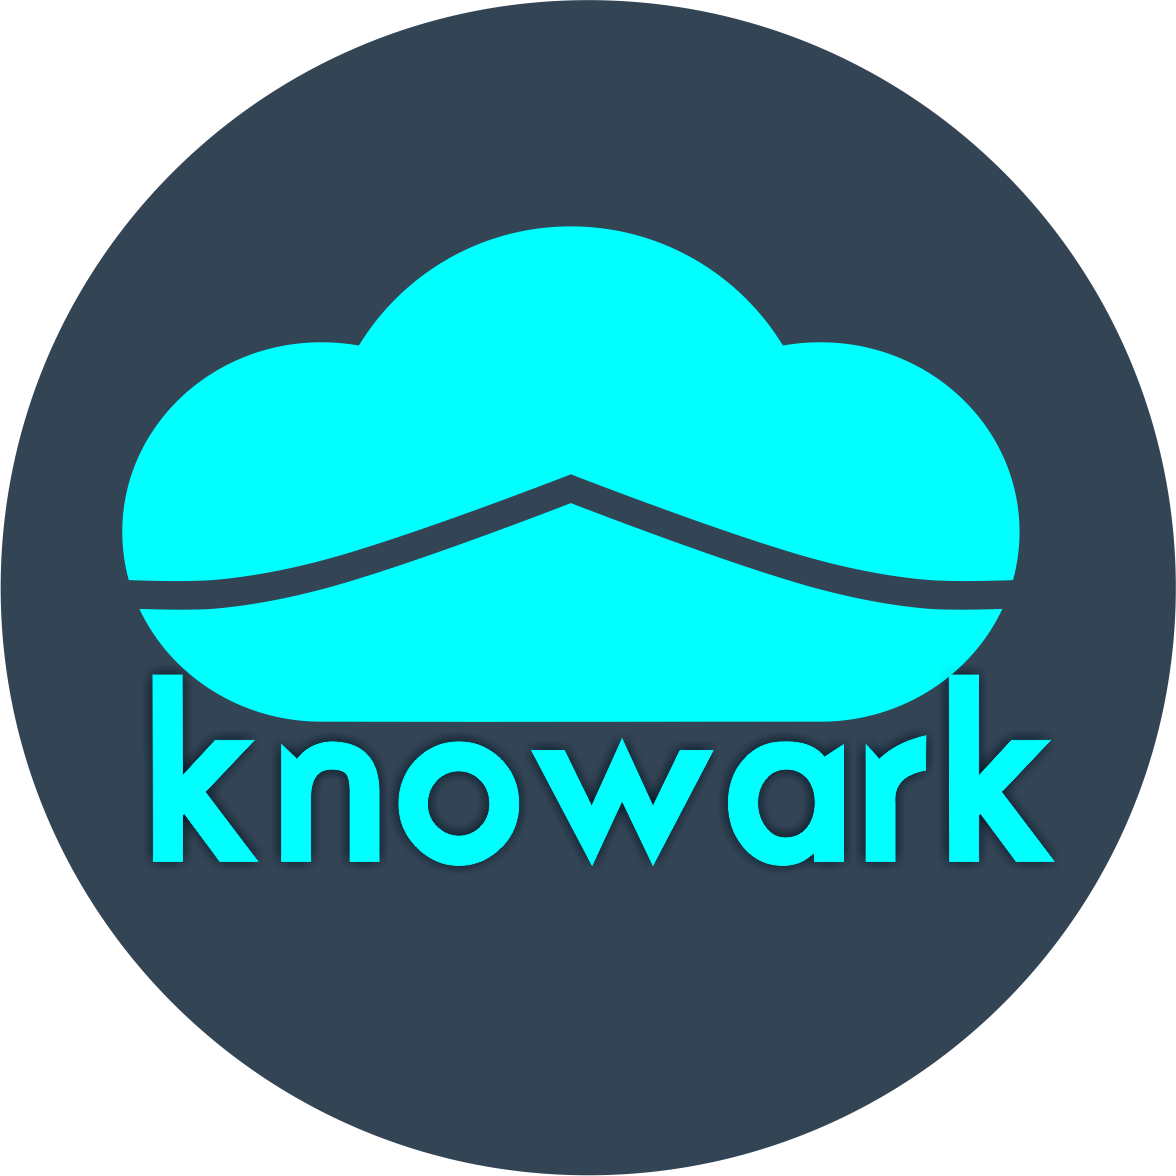 Knowark